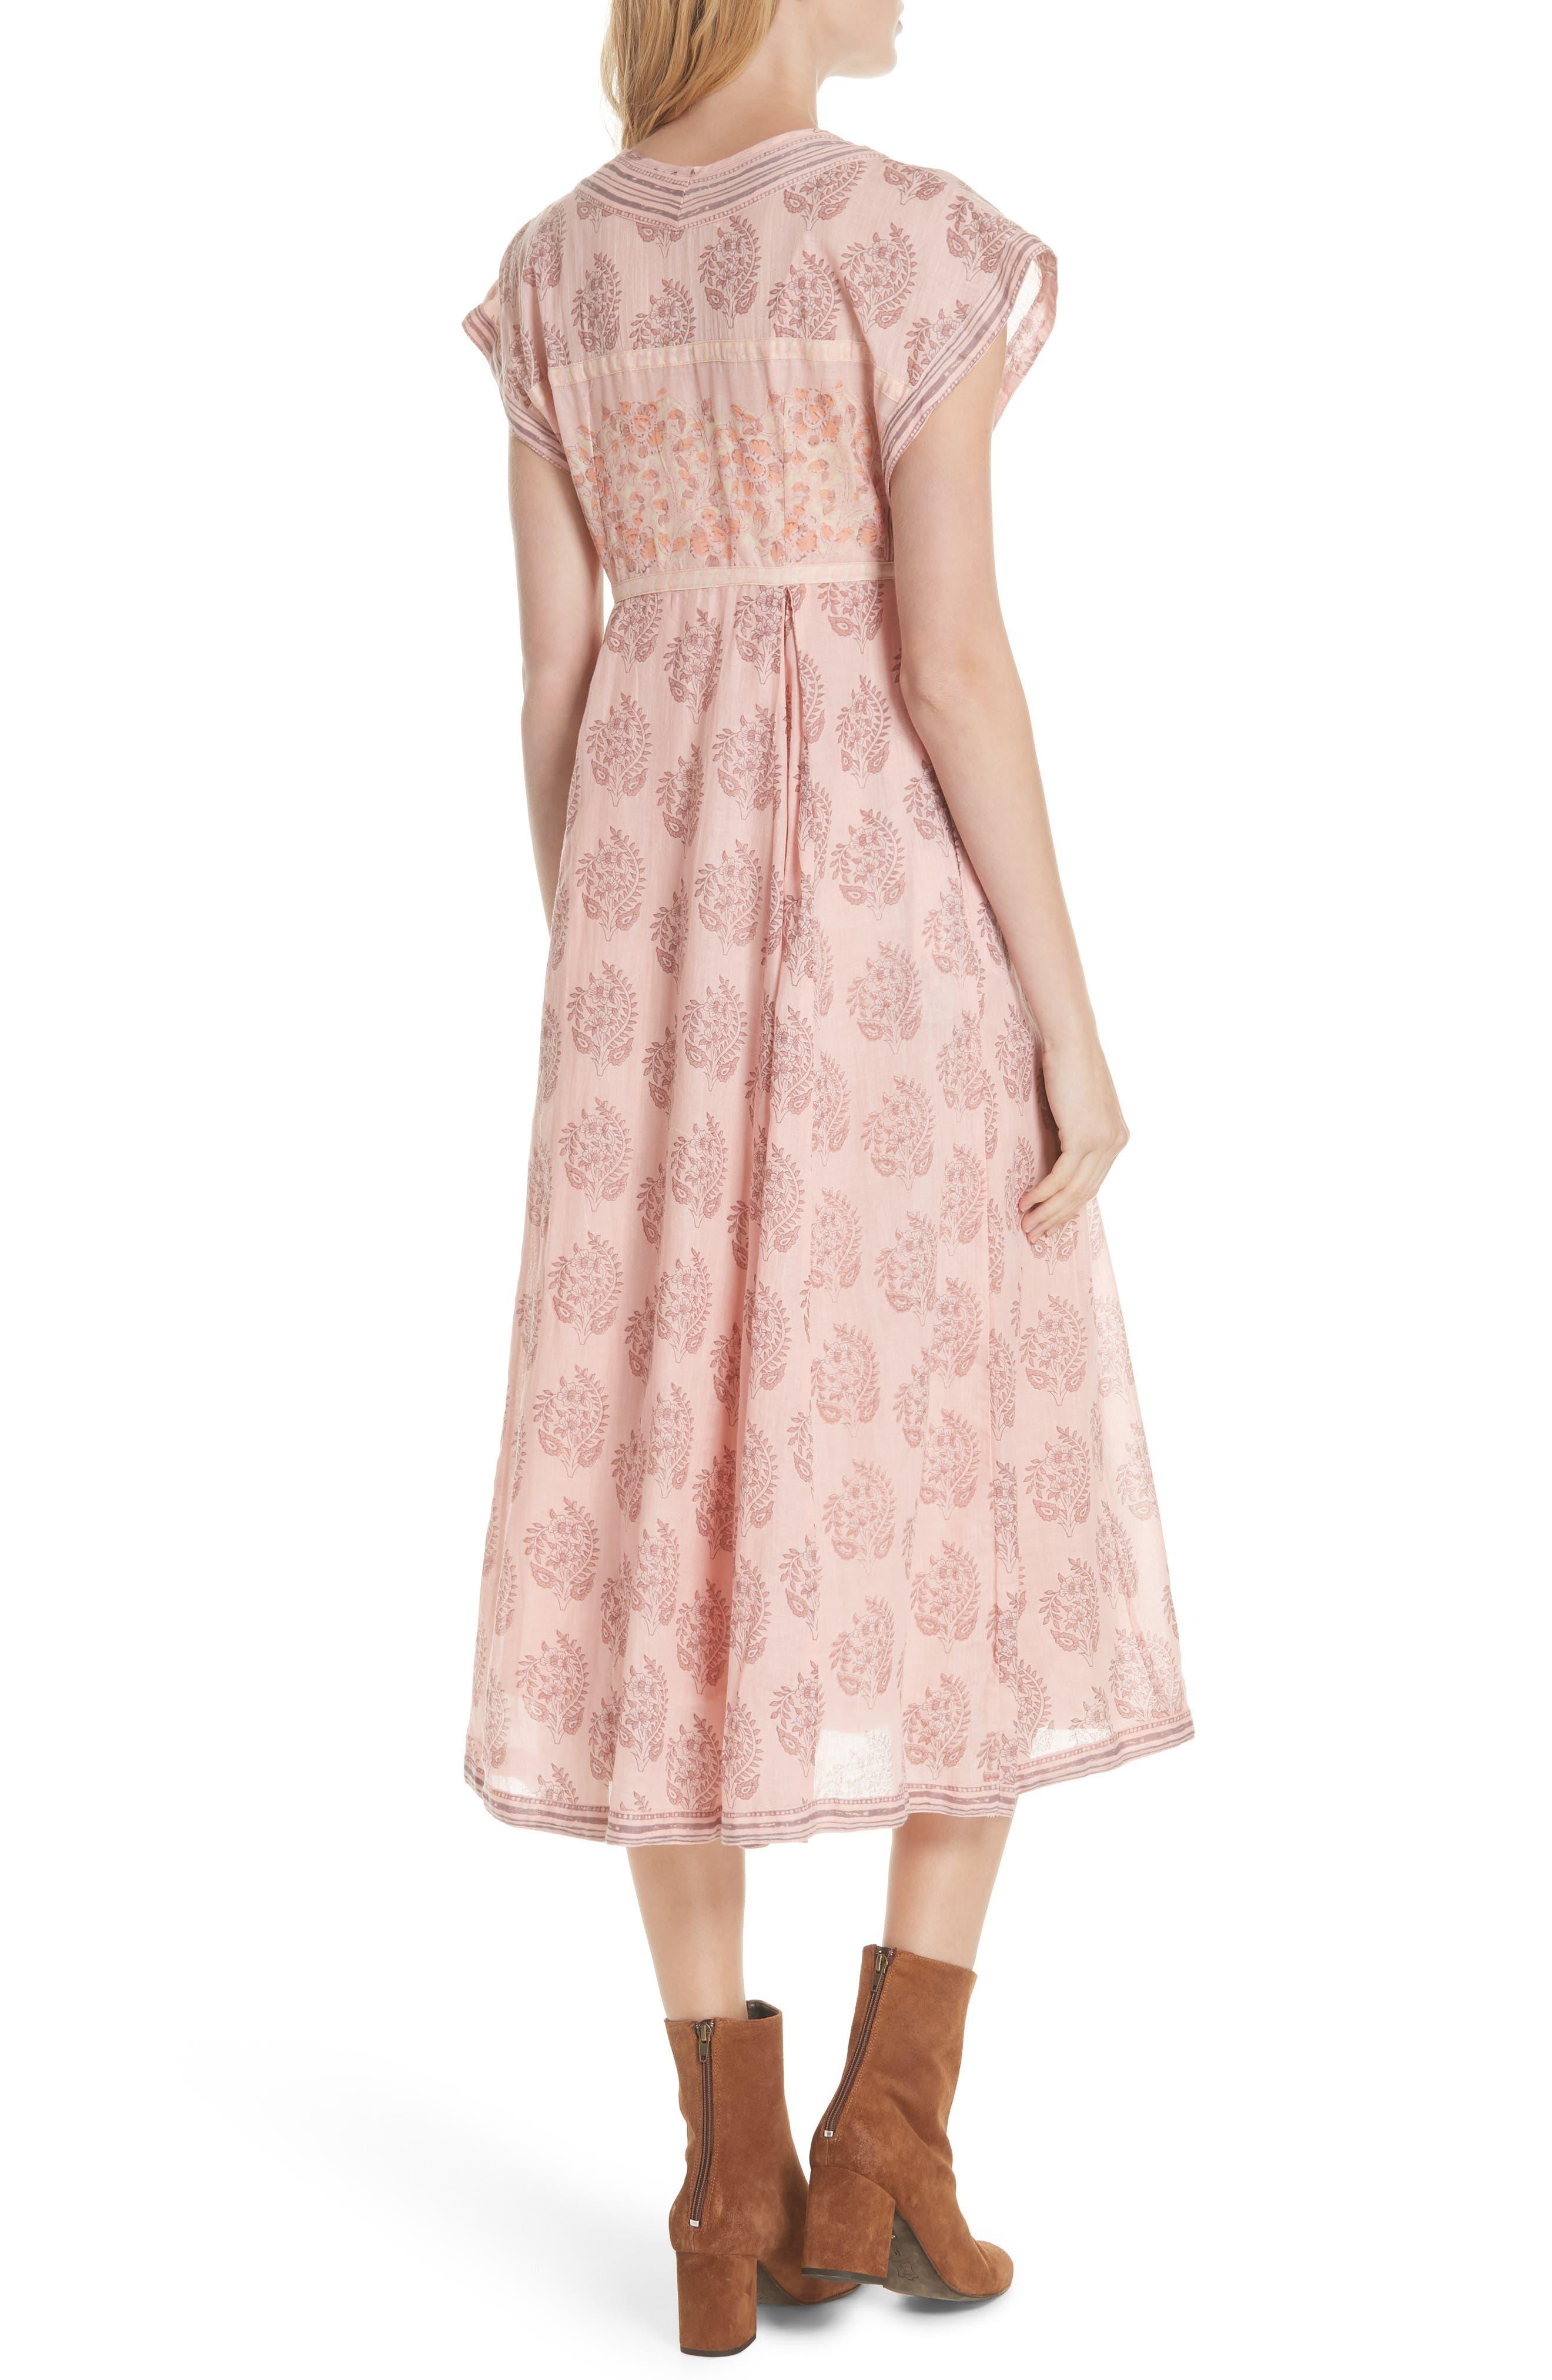 Riakaa Dress,                             Alternate thumbnail 2, color,                             Pink